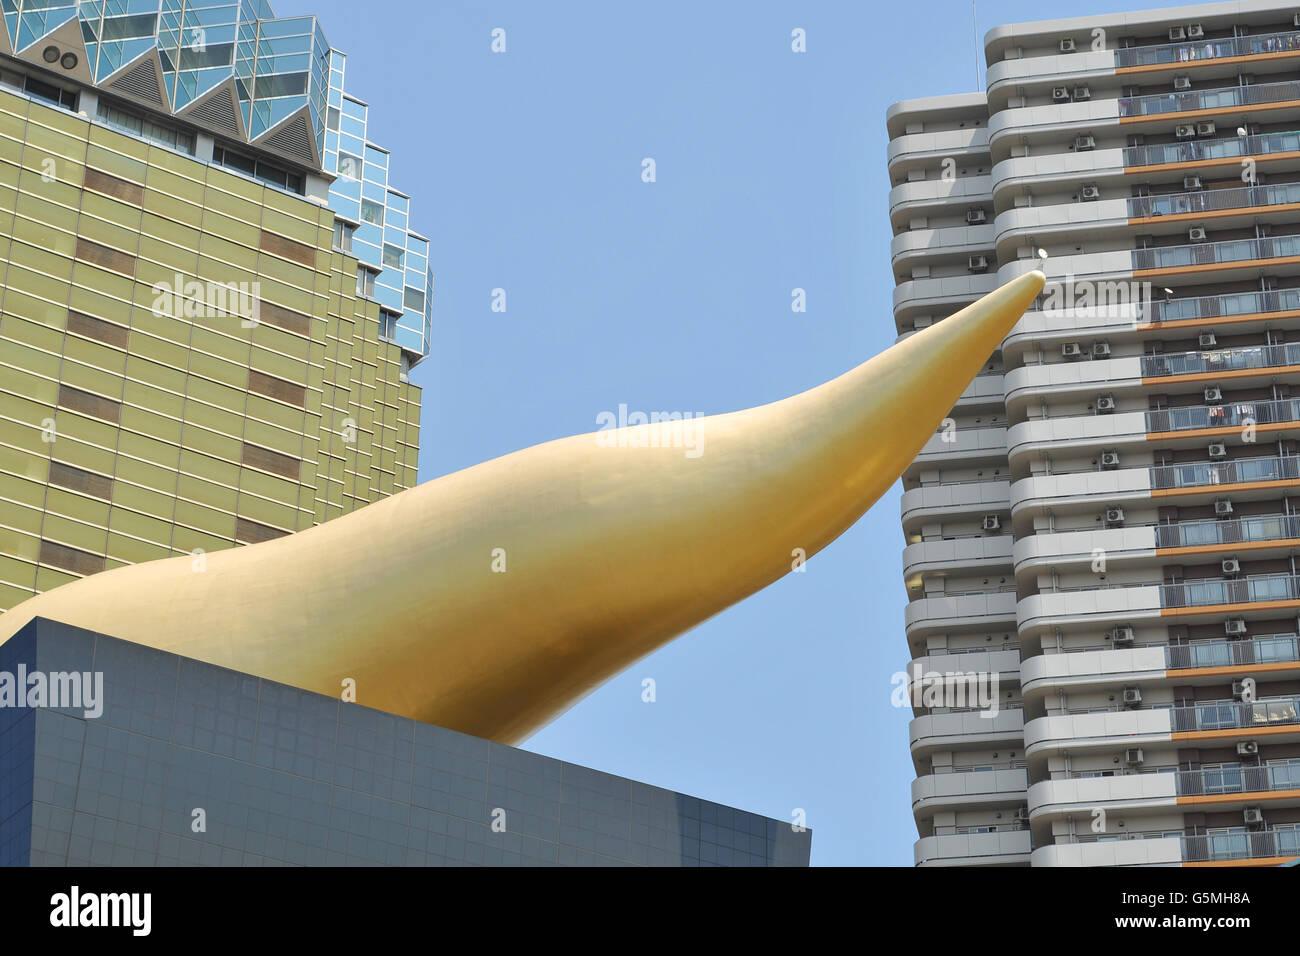 Tokyo buildings view - Stock Image